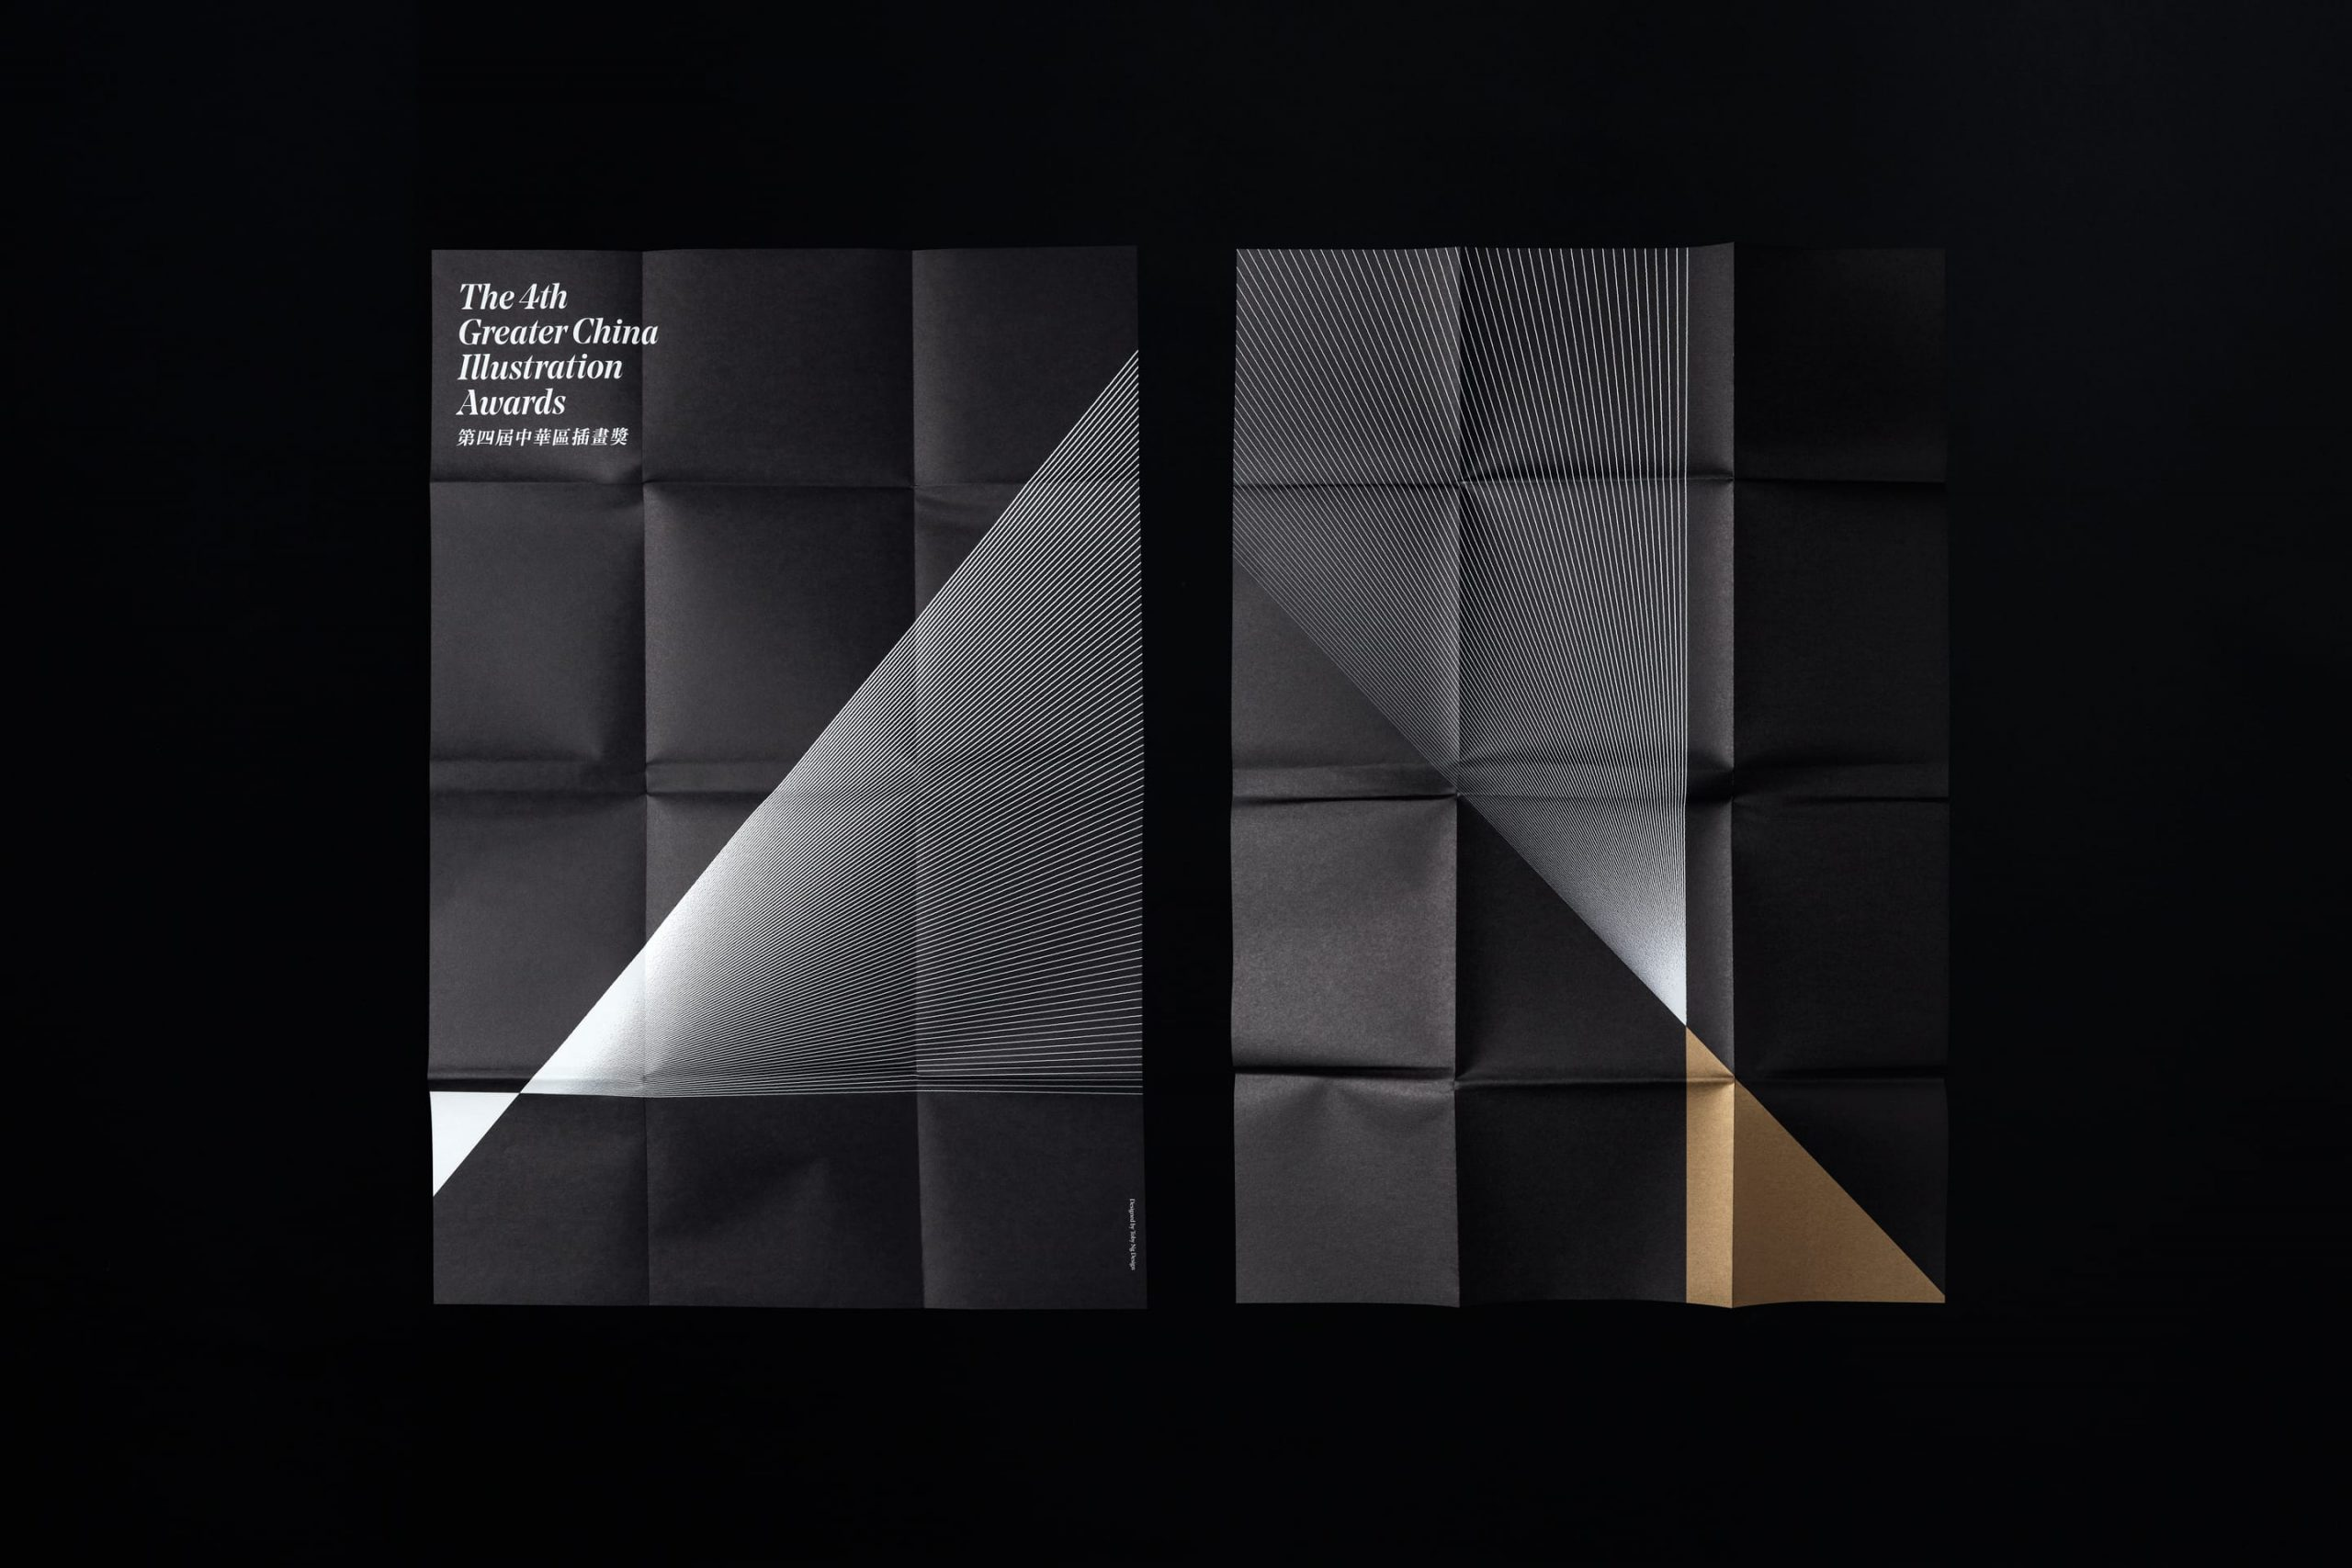 4th-greater-china-illustration-awards_06